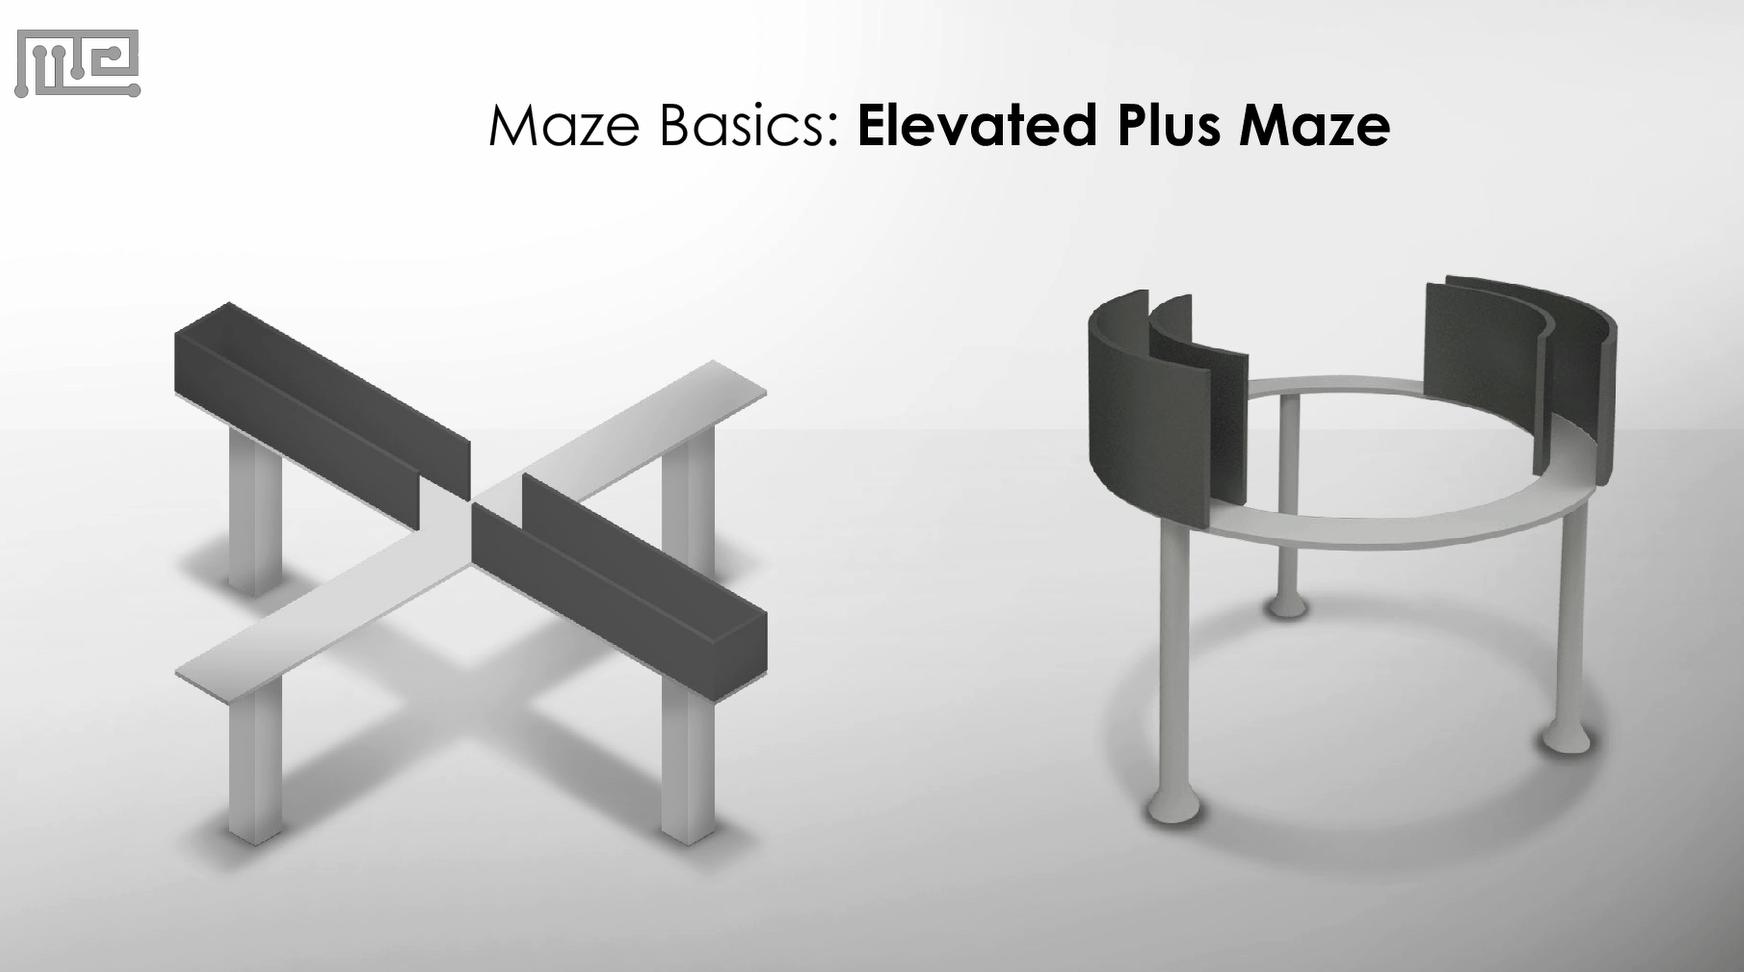 Elevated Plus Maze Apparatus and zero maze